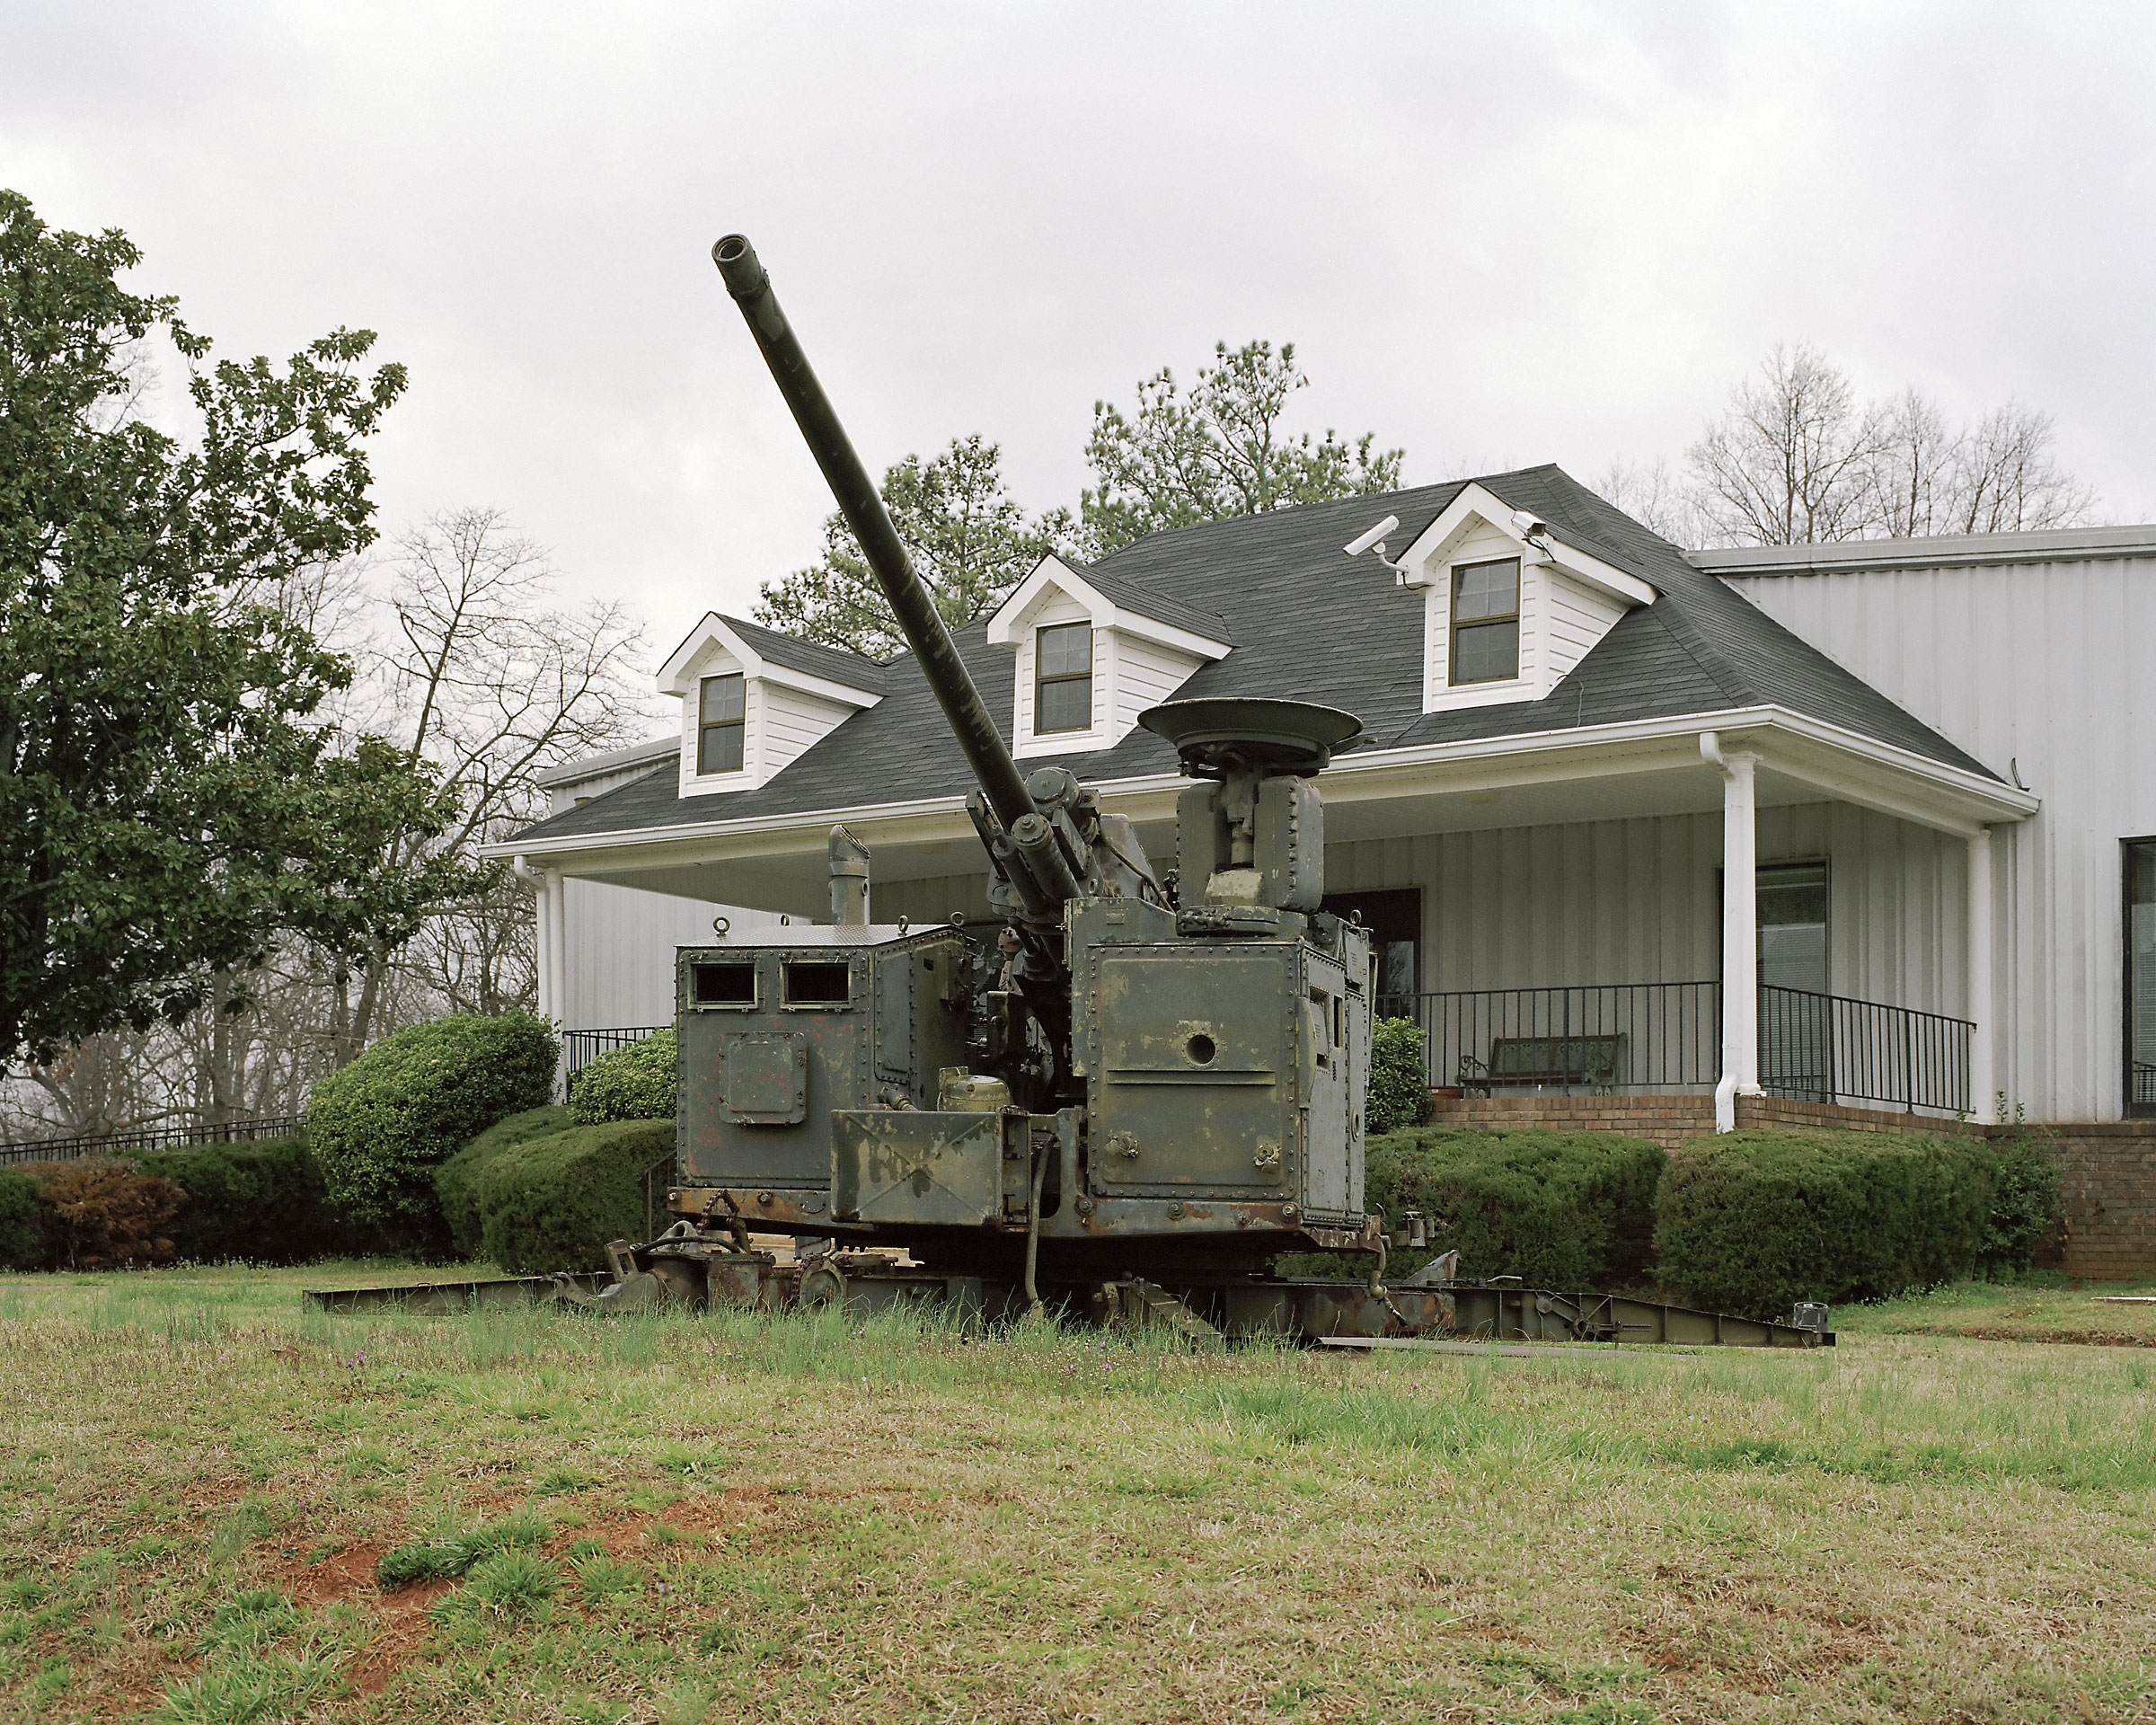 Artillery, American Legion Post 127, Buford, Georgia 2008.